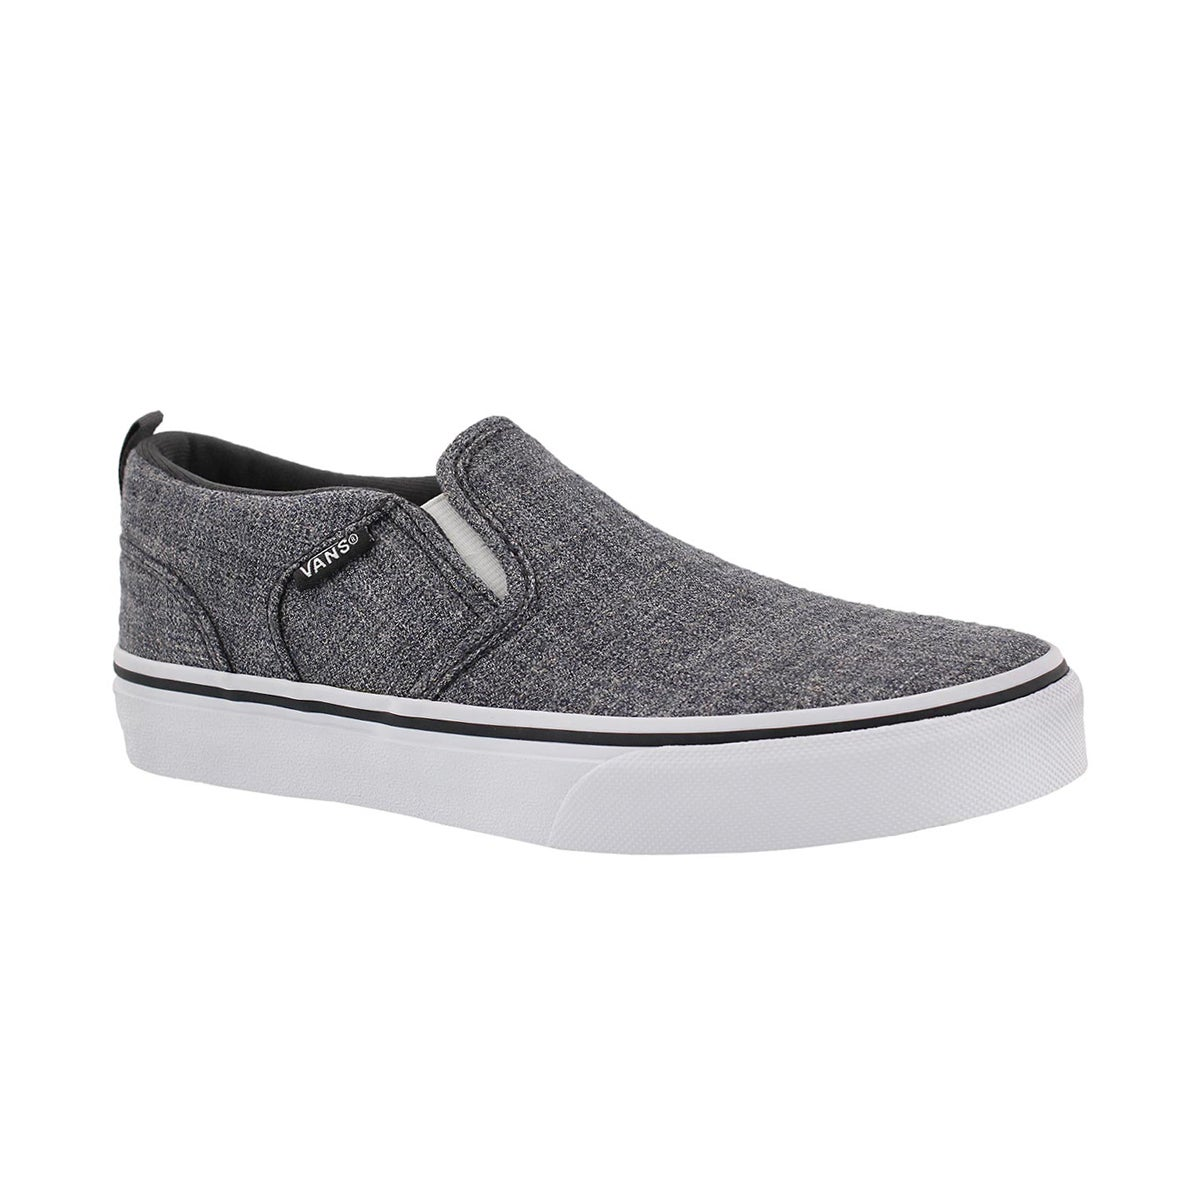 Boys' ASHER grey slip on sneakers